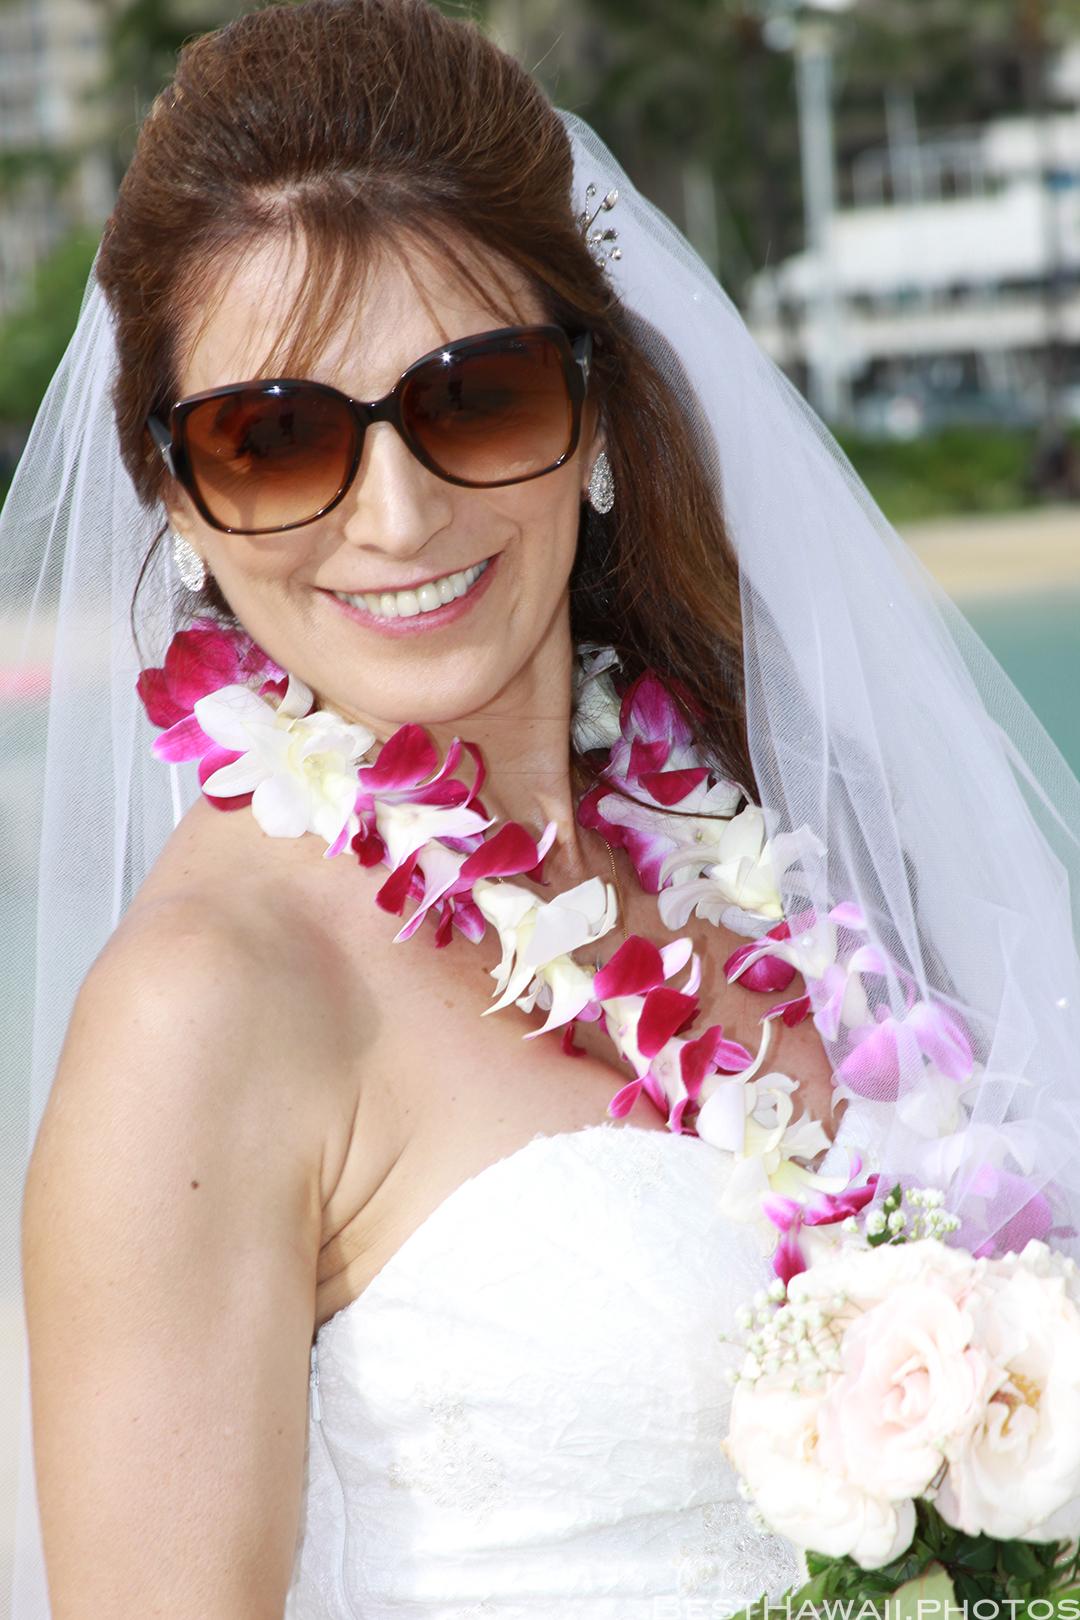 Wedding Photos at Hilton Hawaiian Village by Pasha www.BestHawaii.photos 121820158632